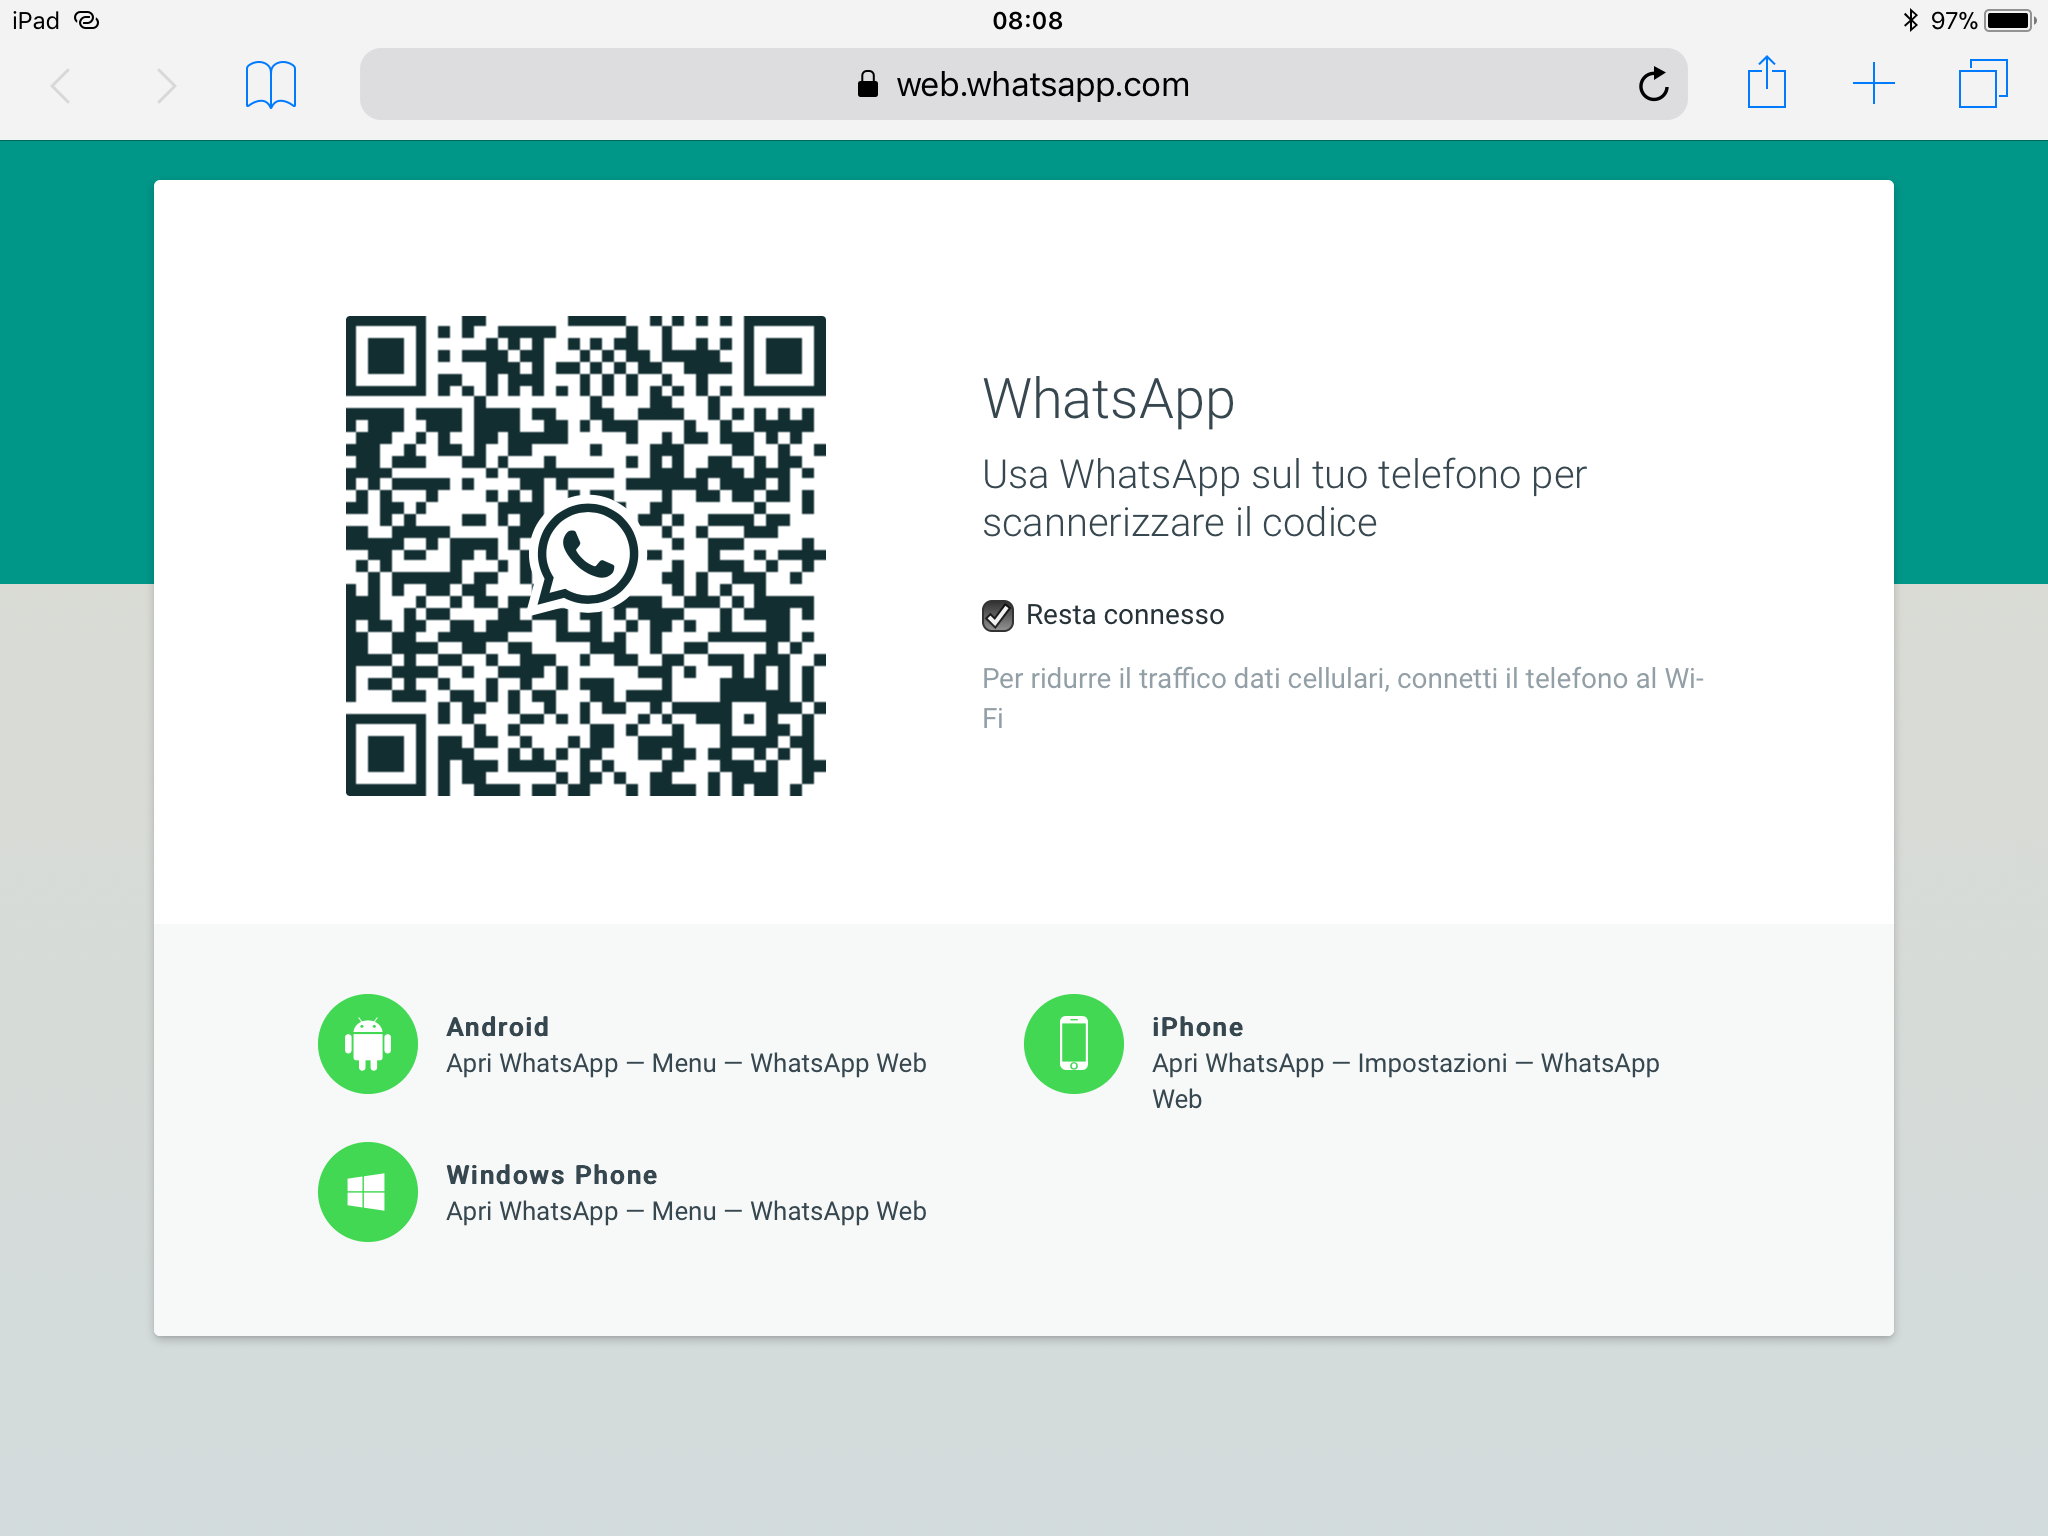 Qr di  web.whatsapp.com